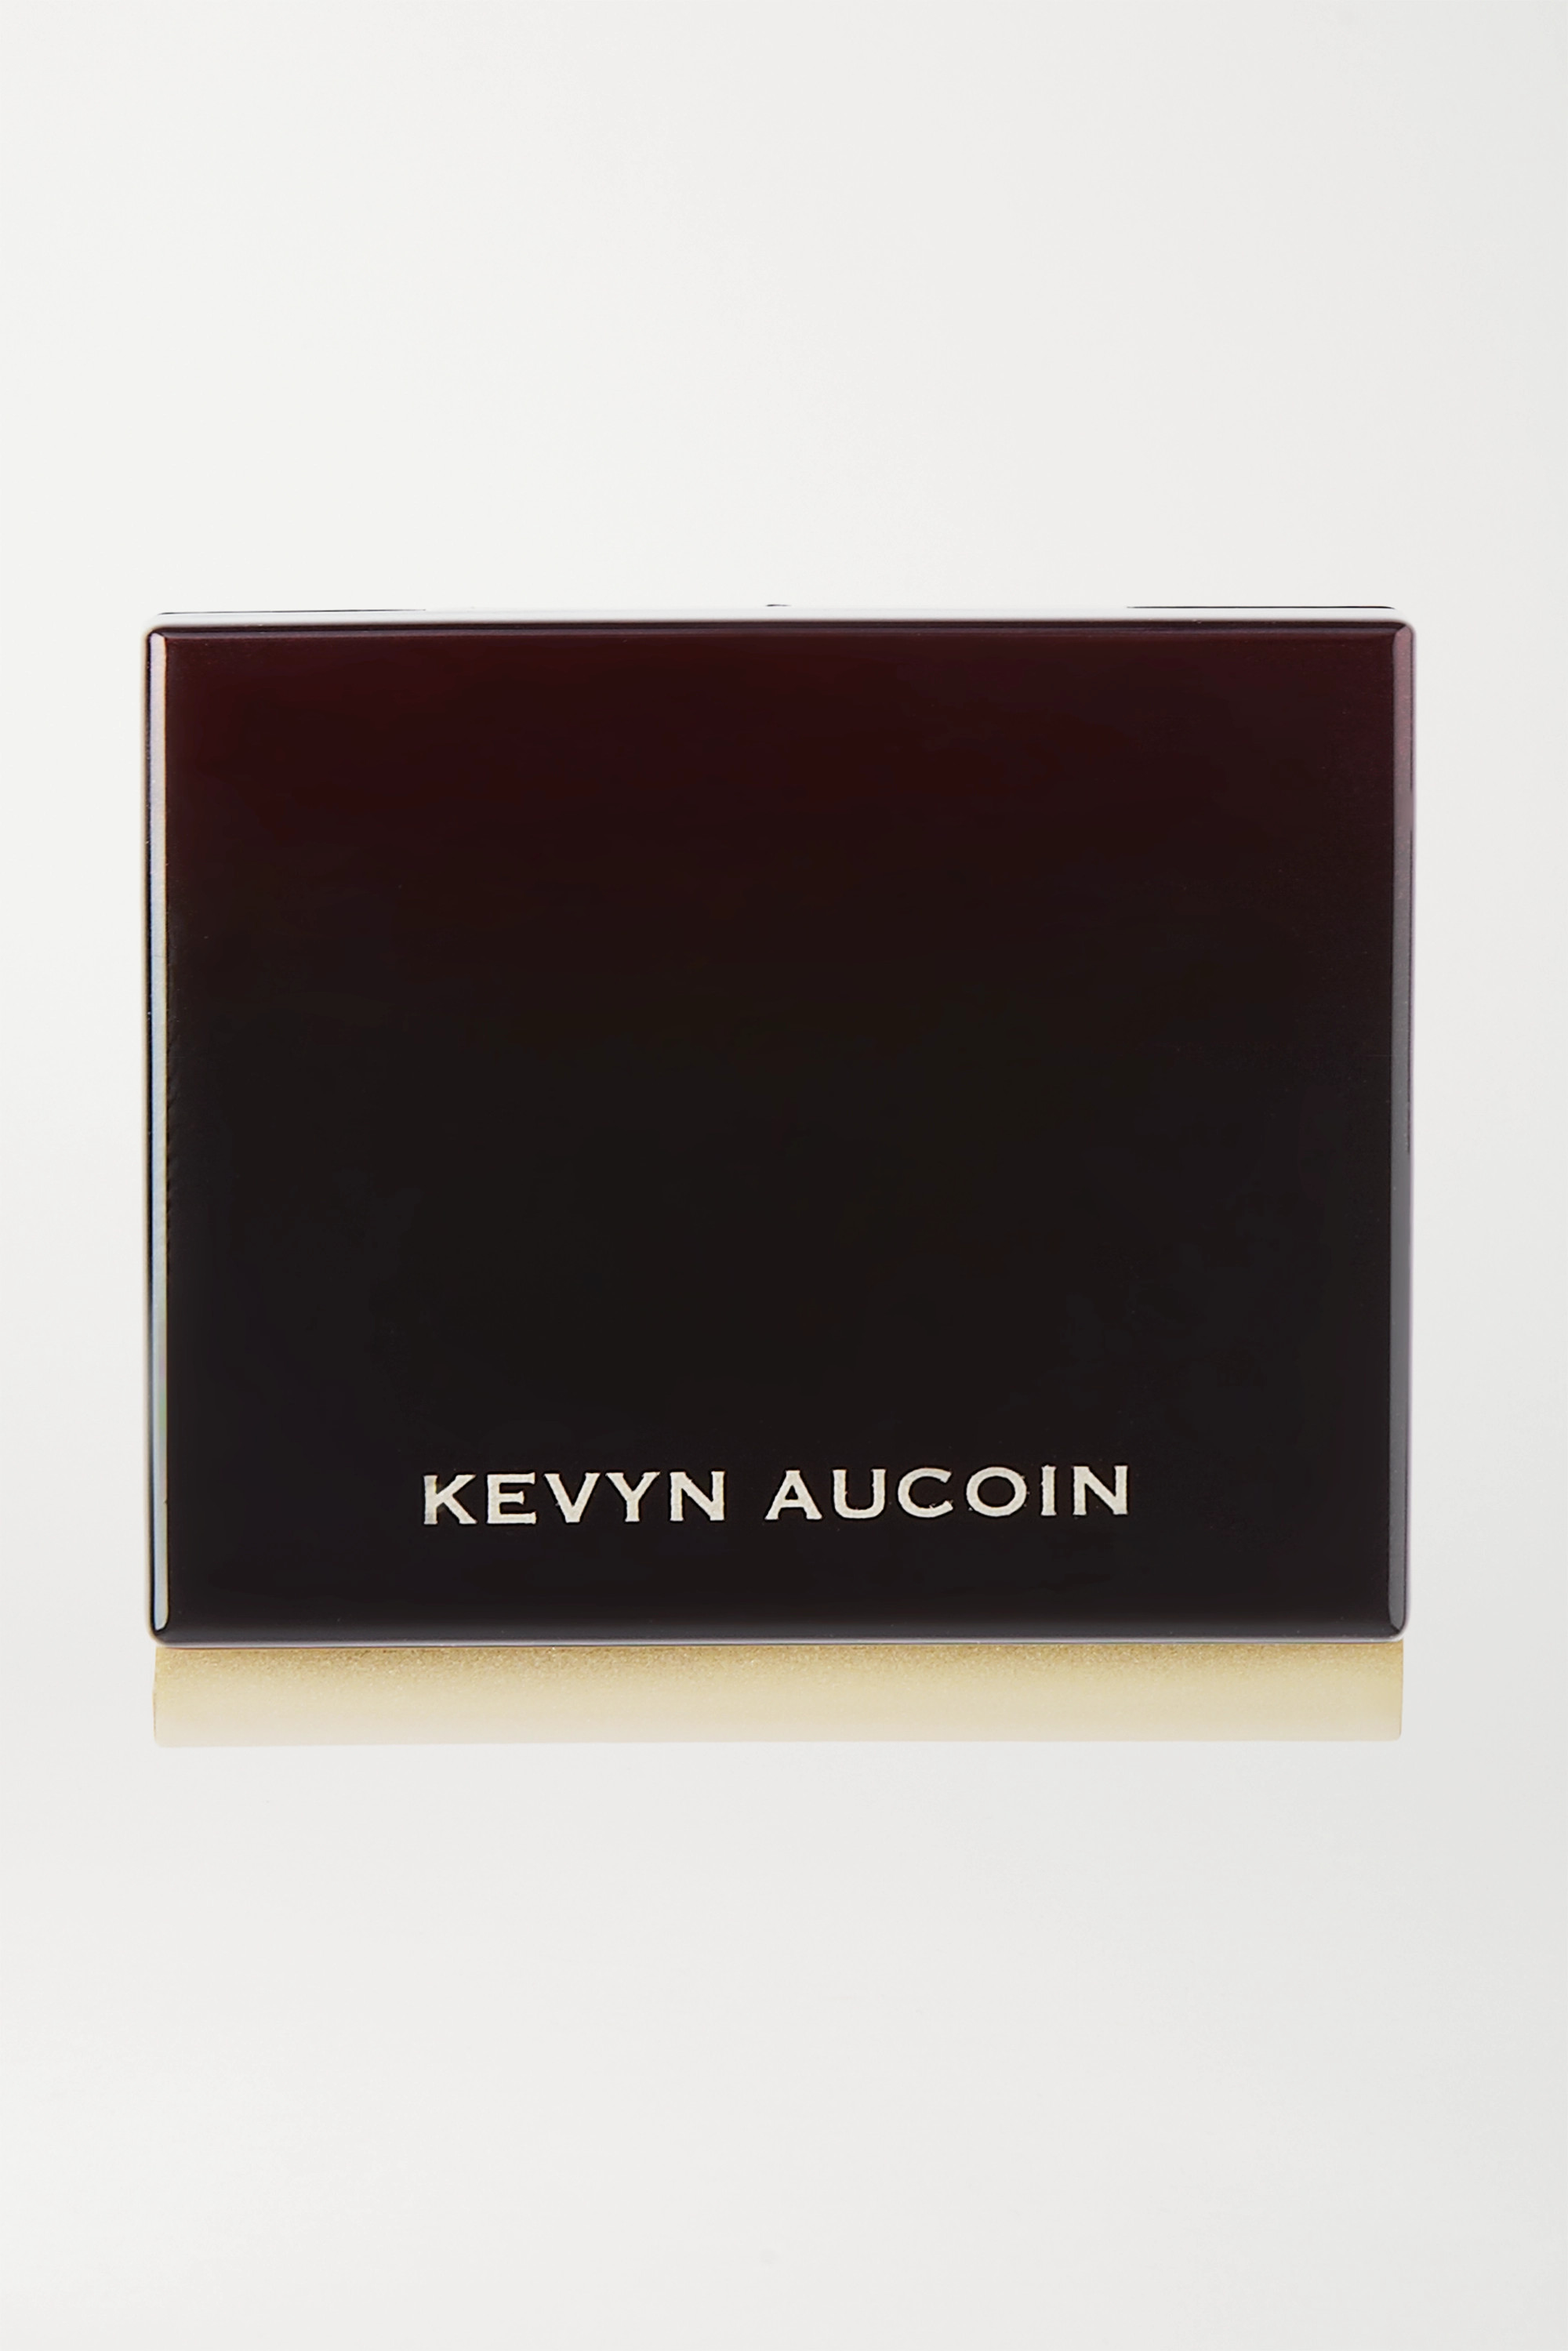 Kevyn Aucoin The Sculpting Powder - Light